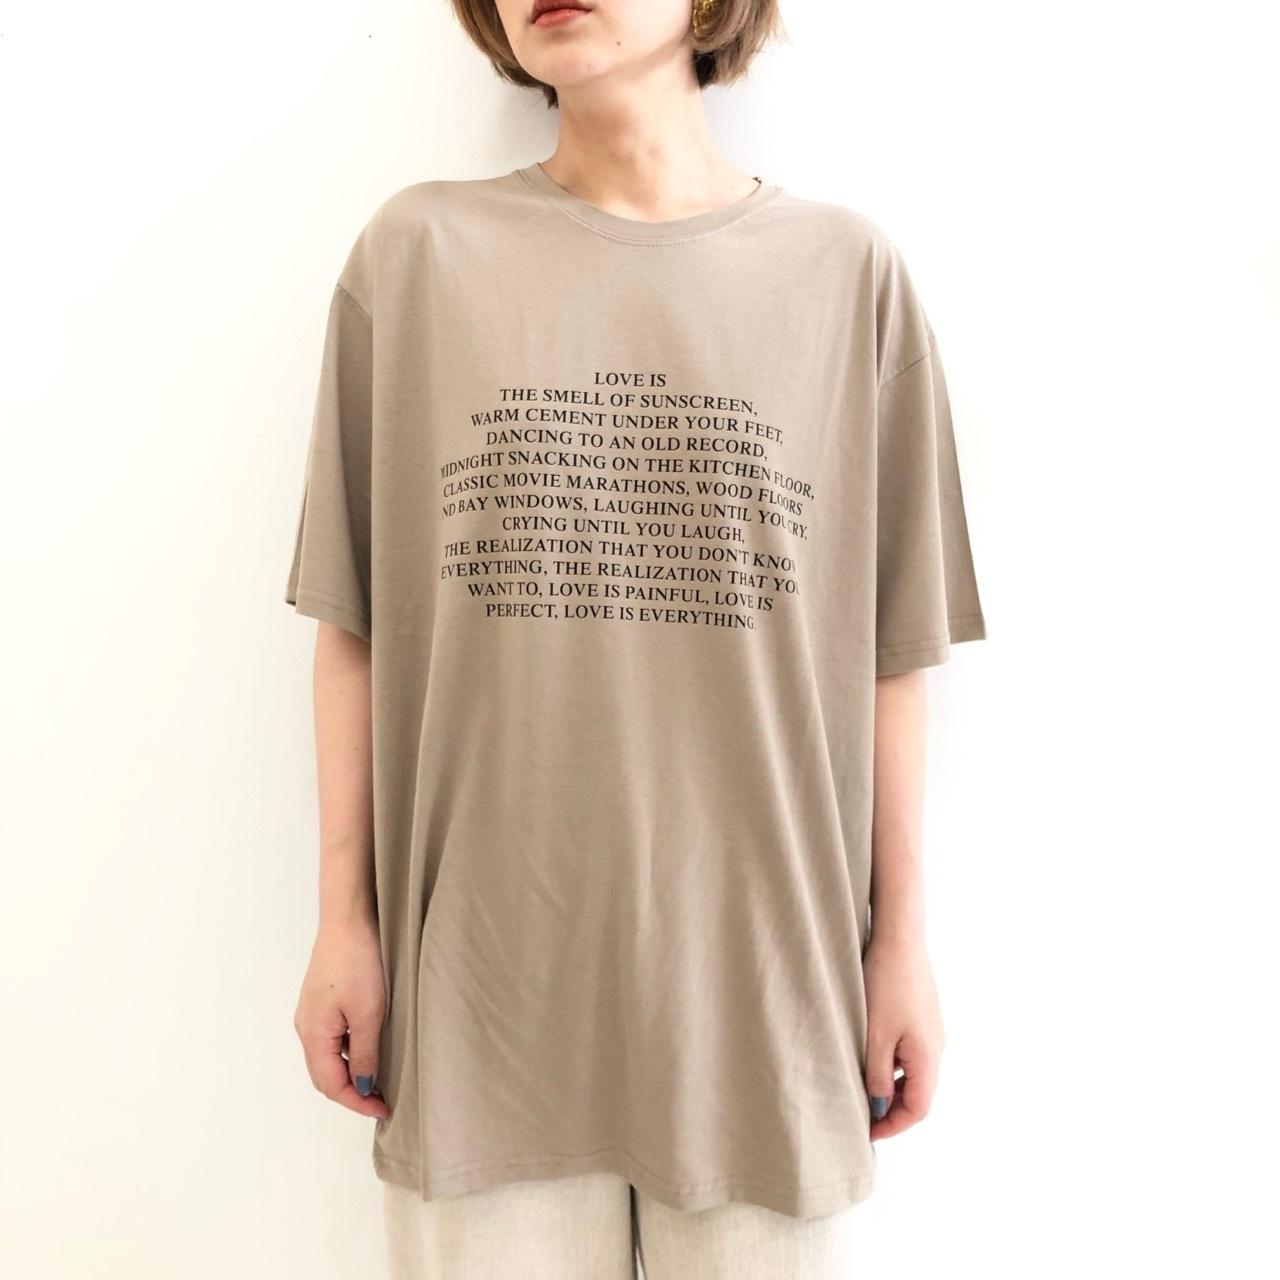 【 Days 】- 119-1384 - ロゴプリントBIGTeeシャツ